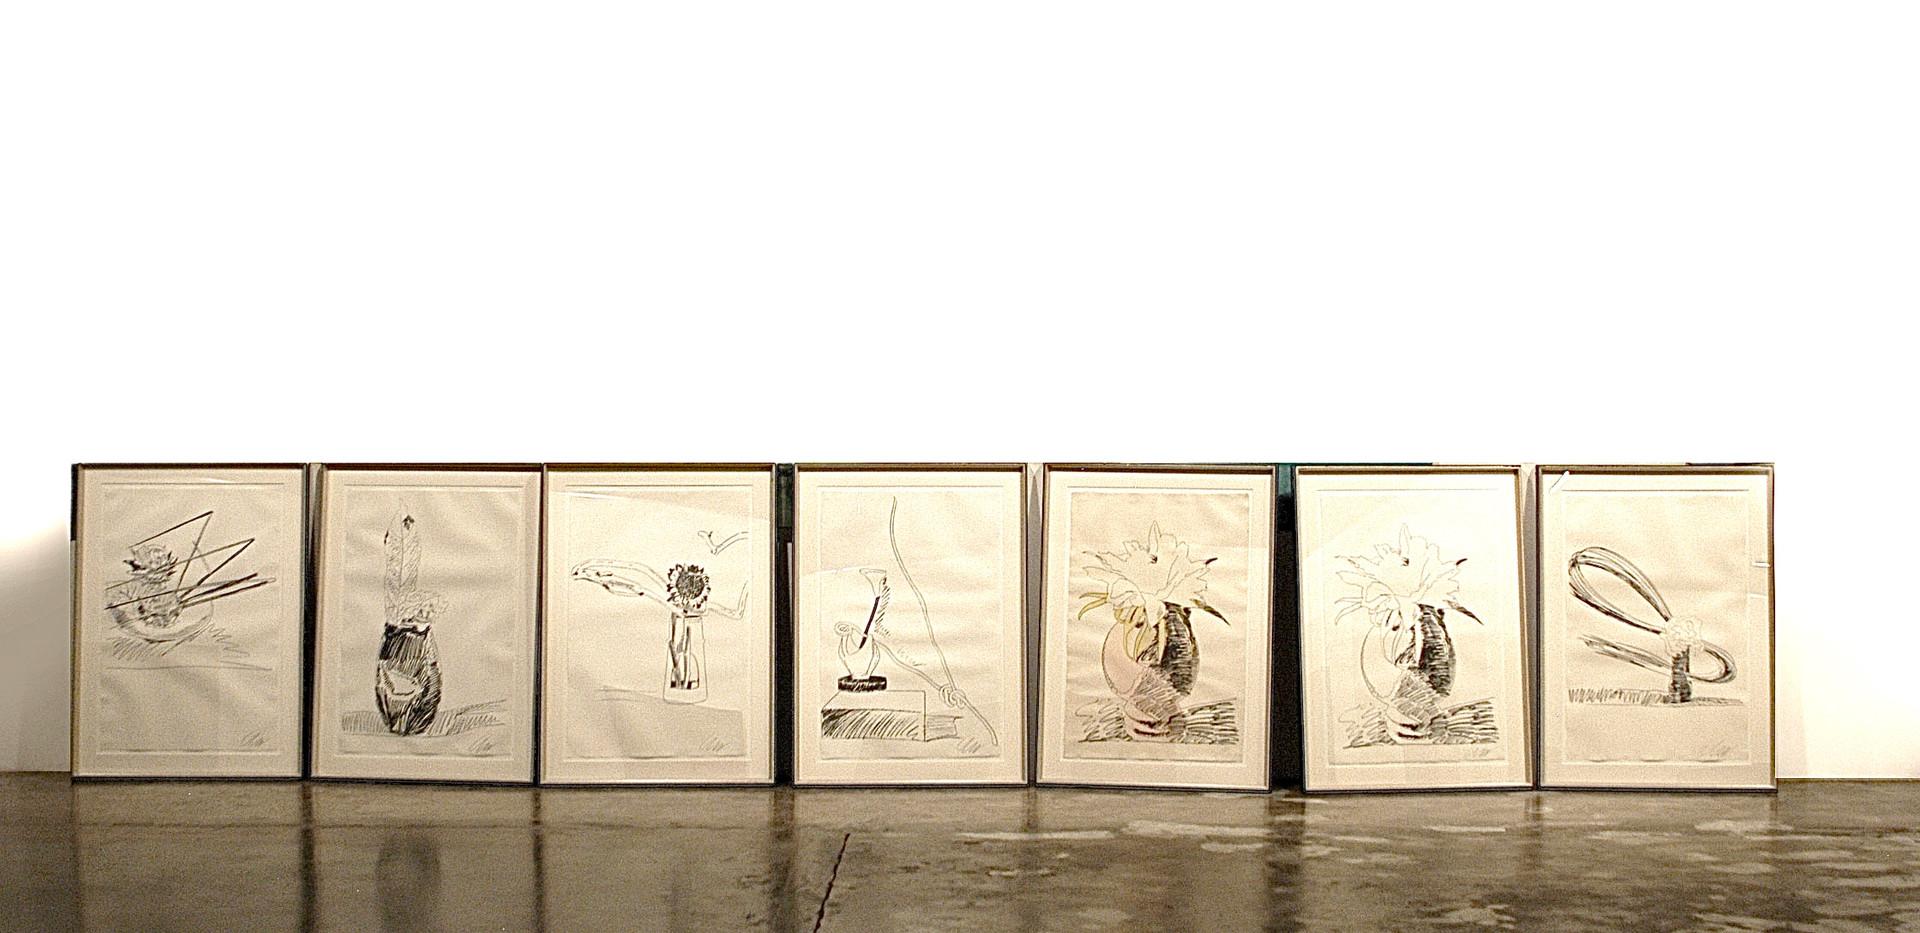 Andy Warhol Flower Black & White Screen print 70 x 100 cm 1974